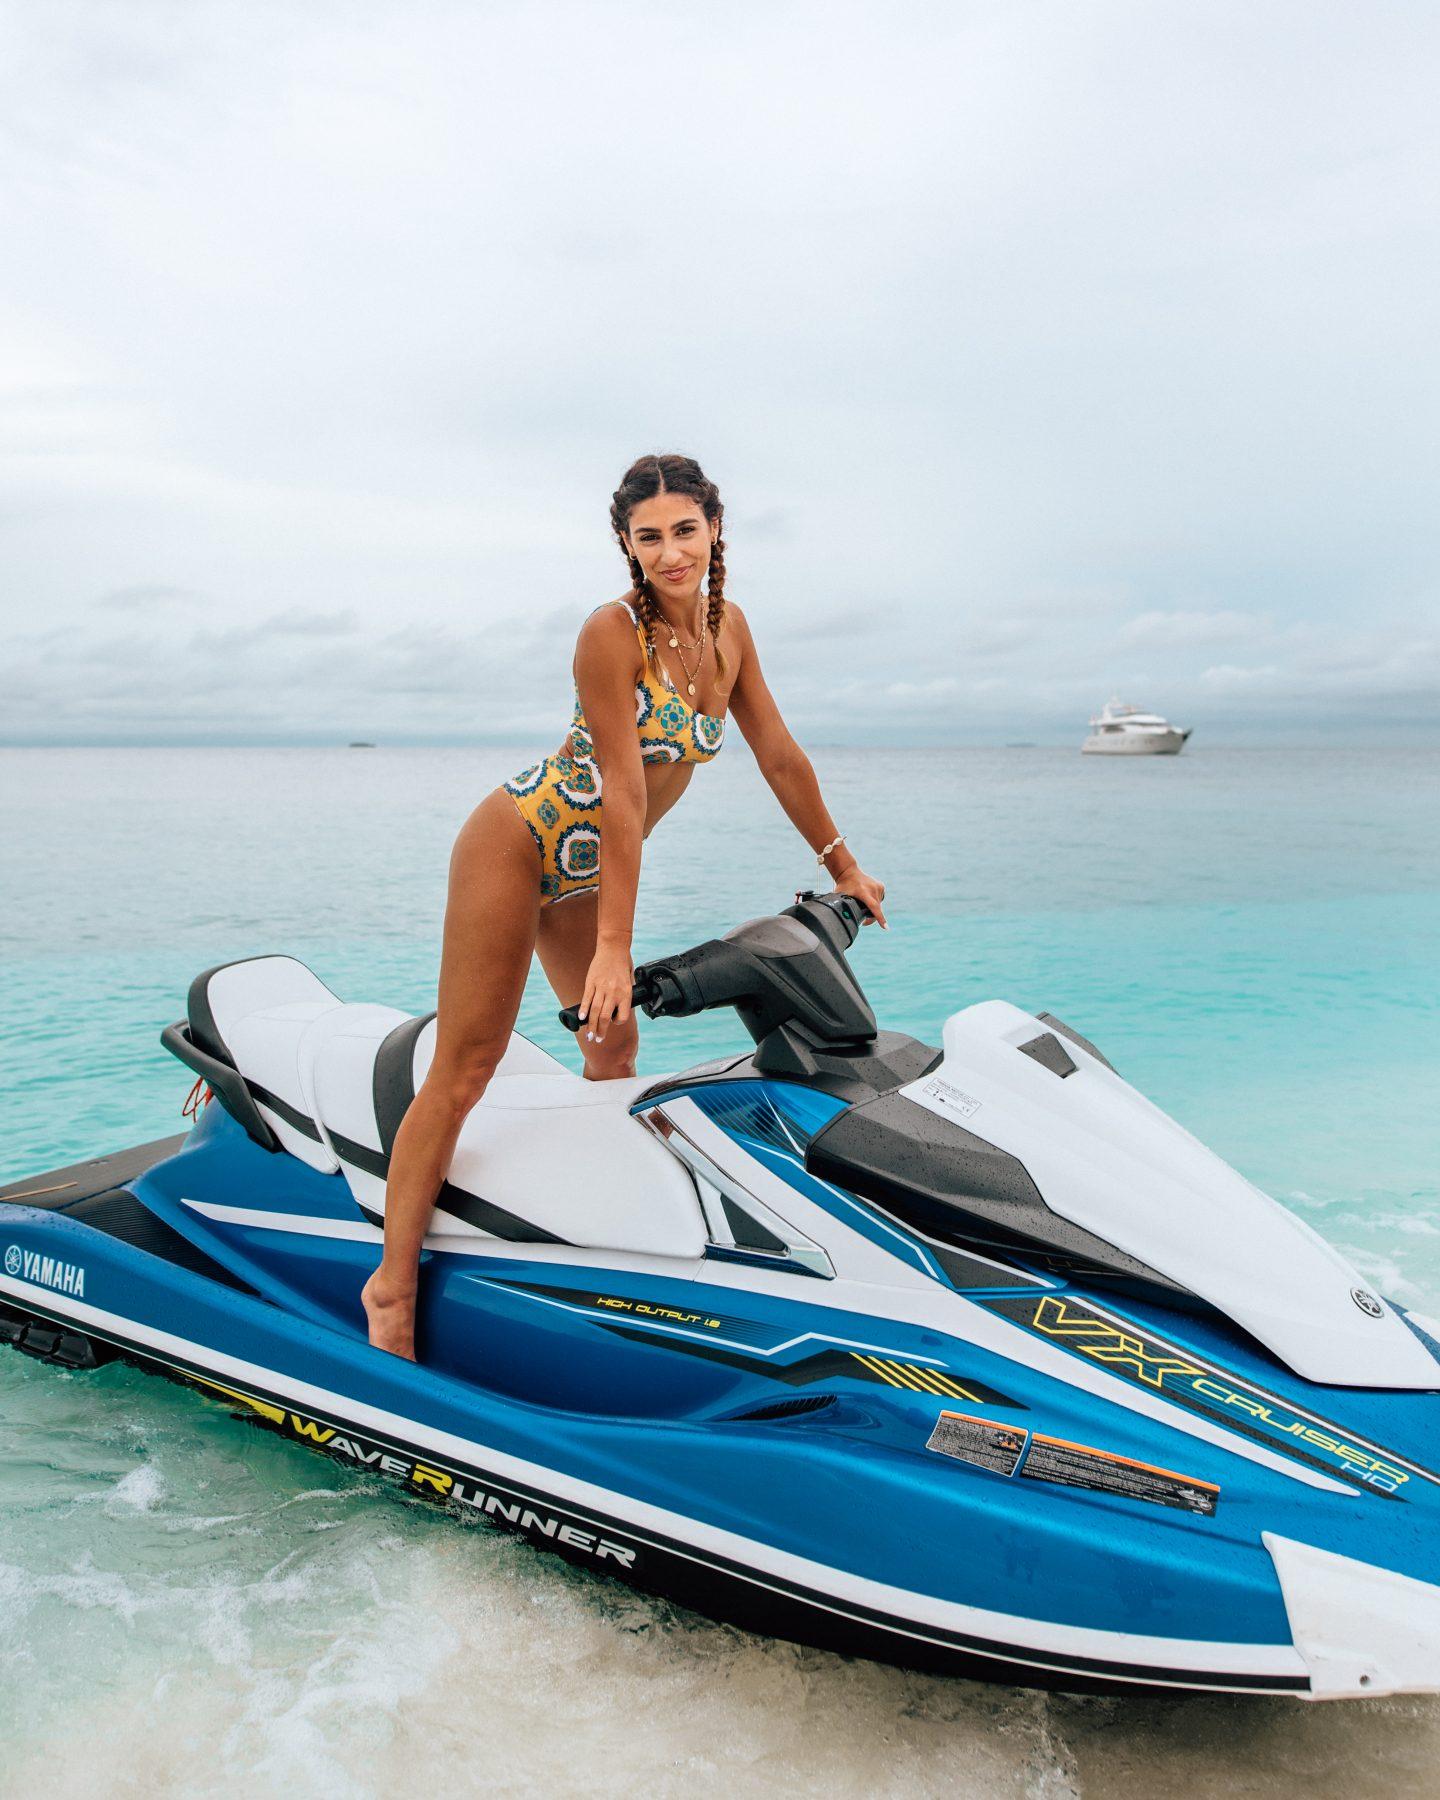 Woman on jetski in the Maldives